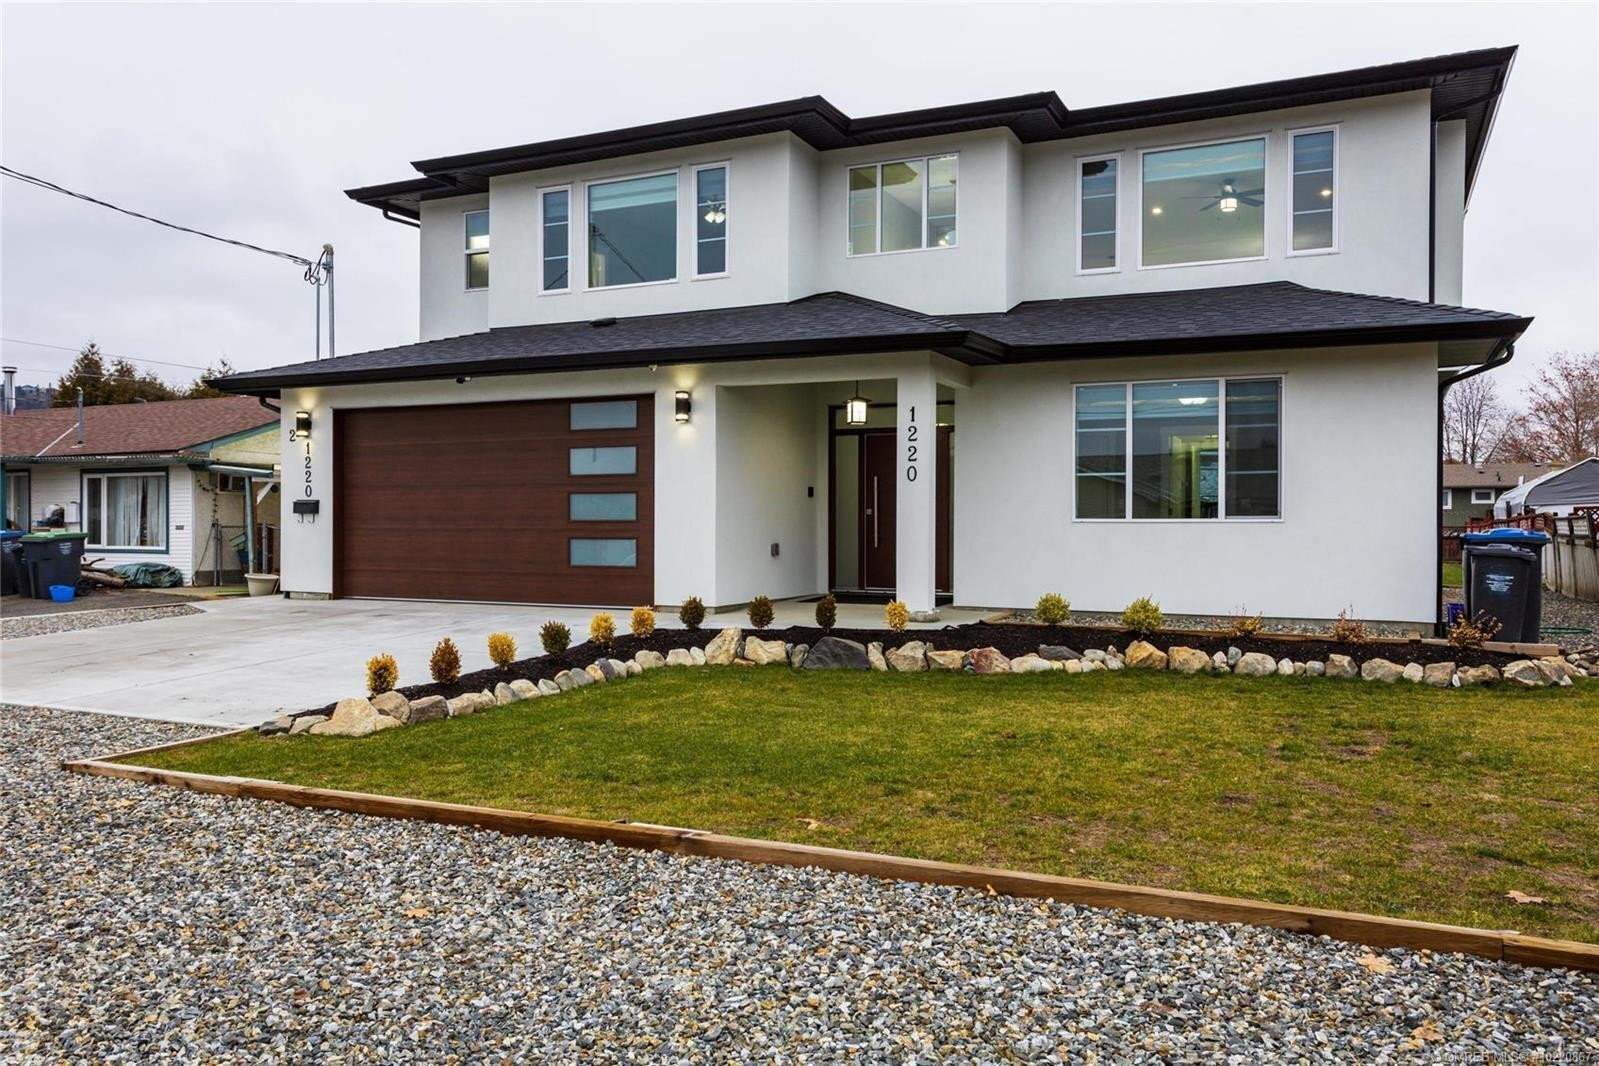 House for sale at 1220 Gaggin Rd Kelowna British Columbia - MLS: 10220867